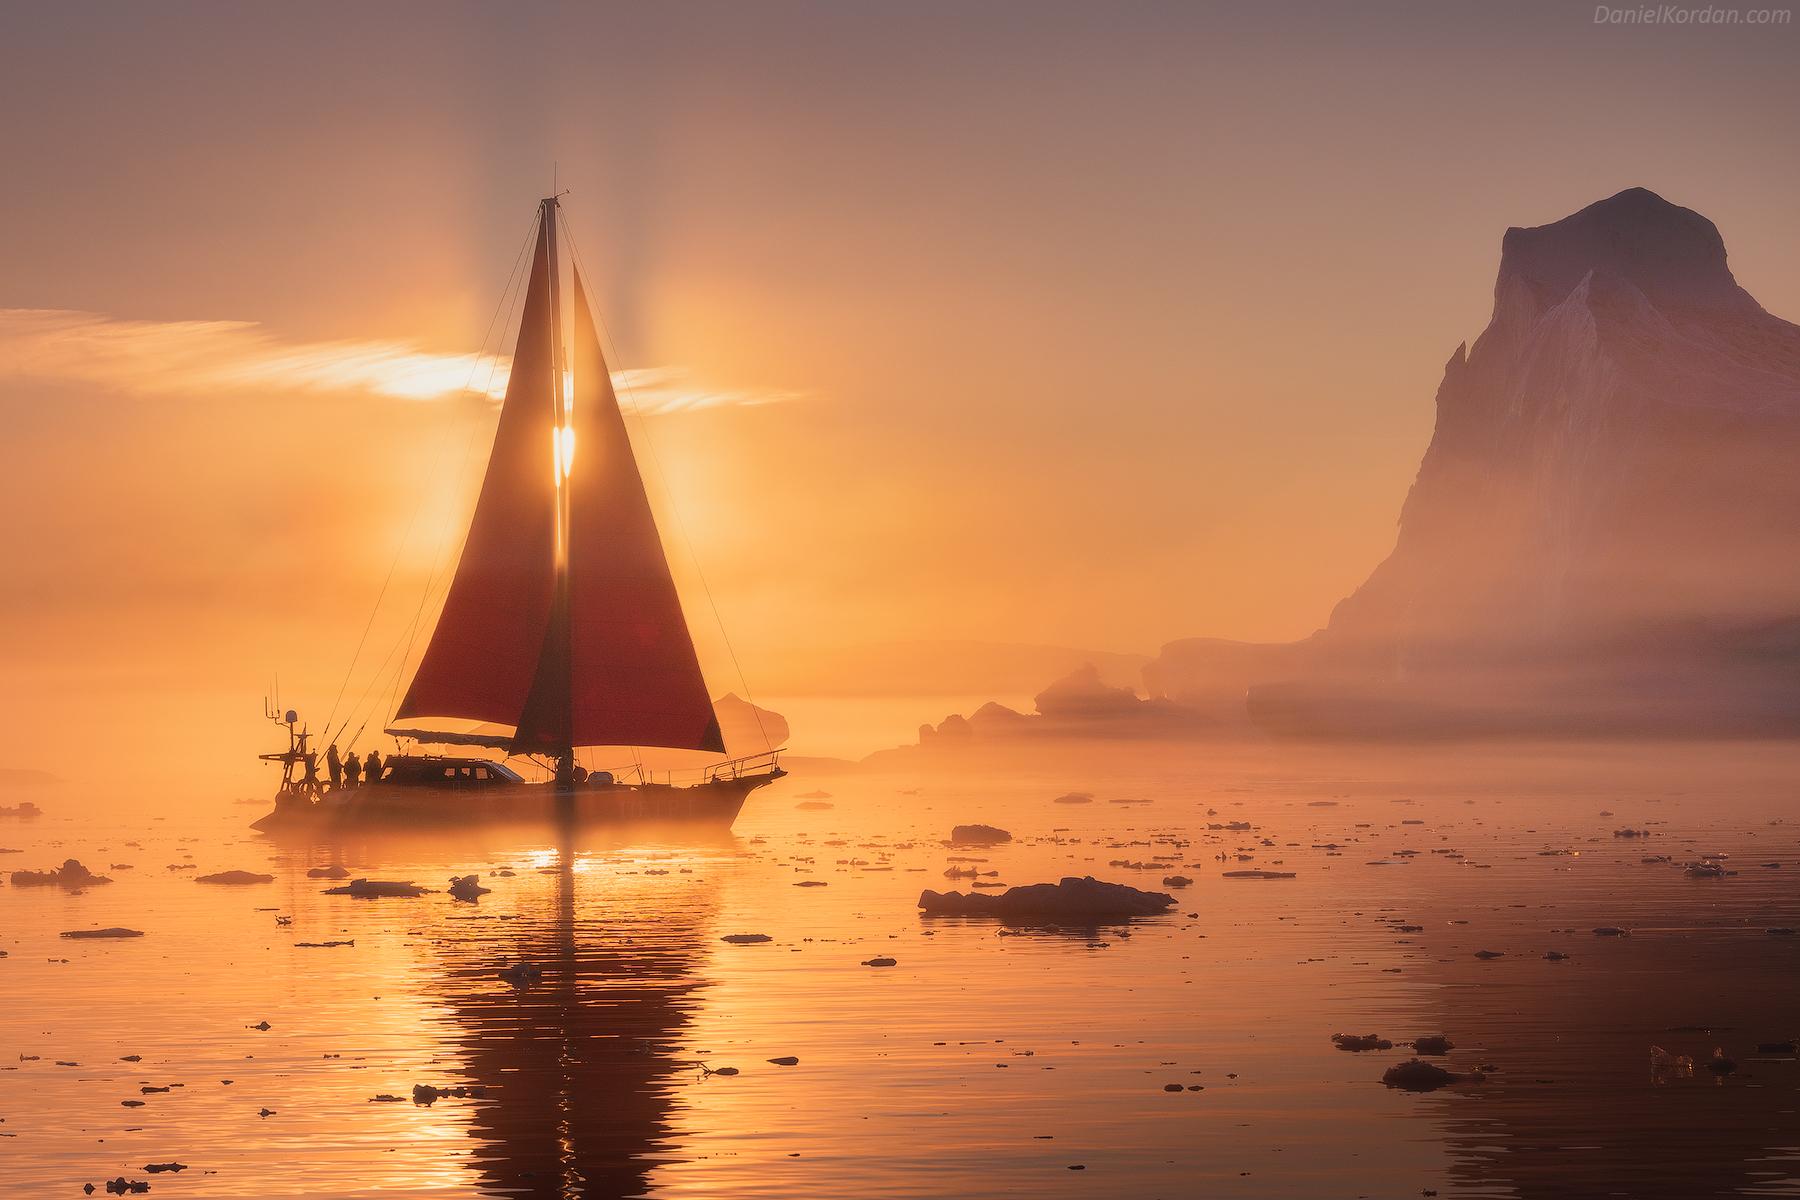 Red Sails in Greenland | Summer Photo Workshop - day 5